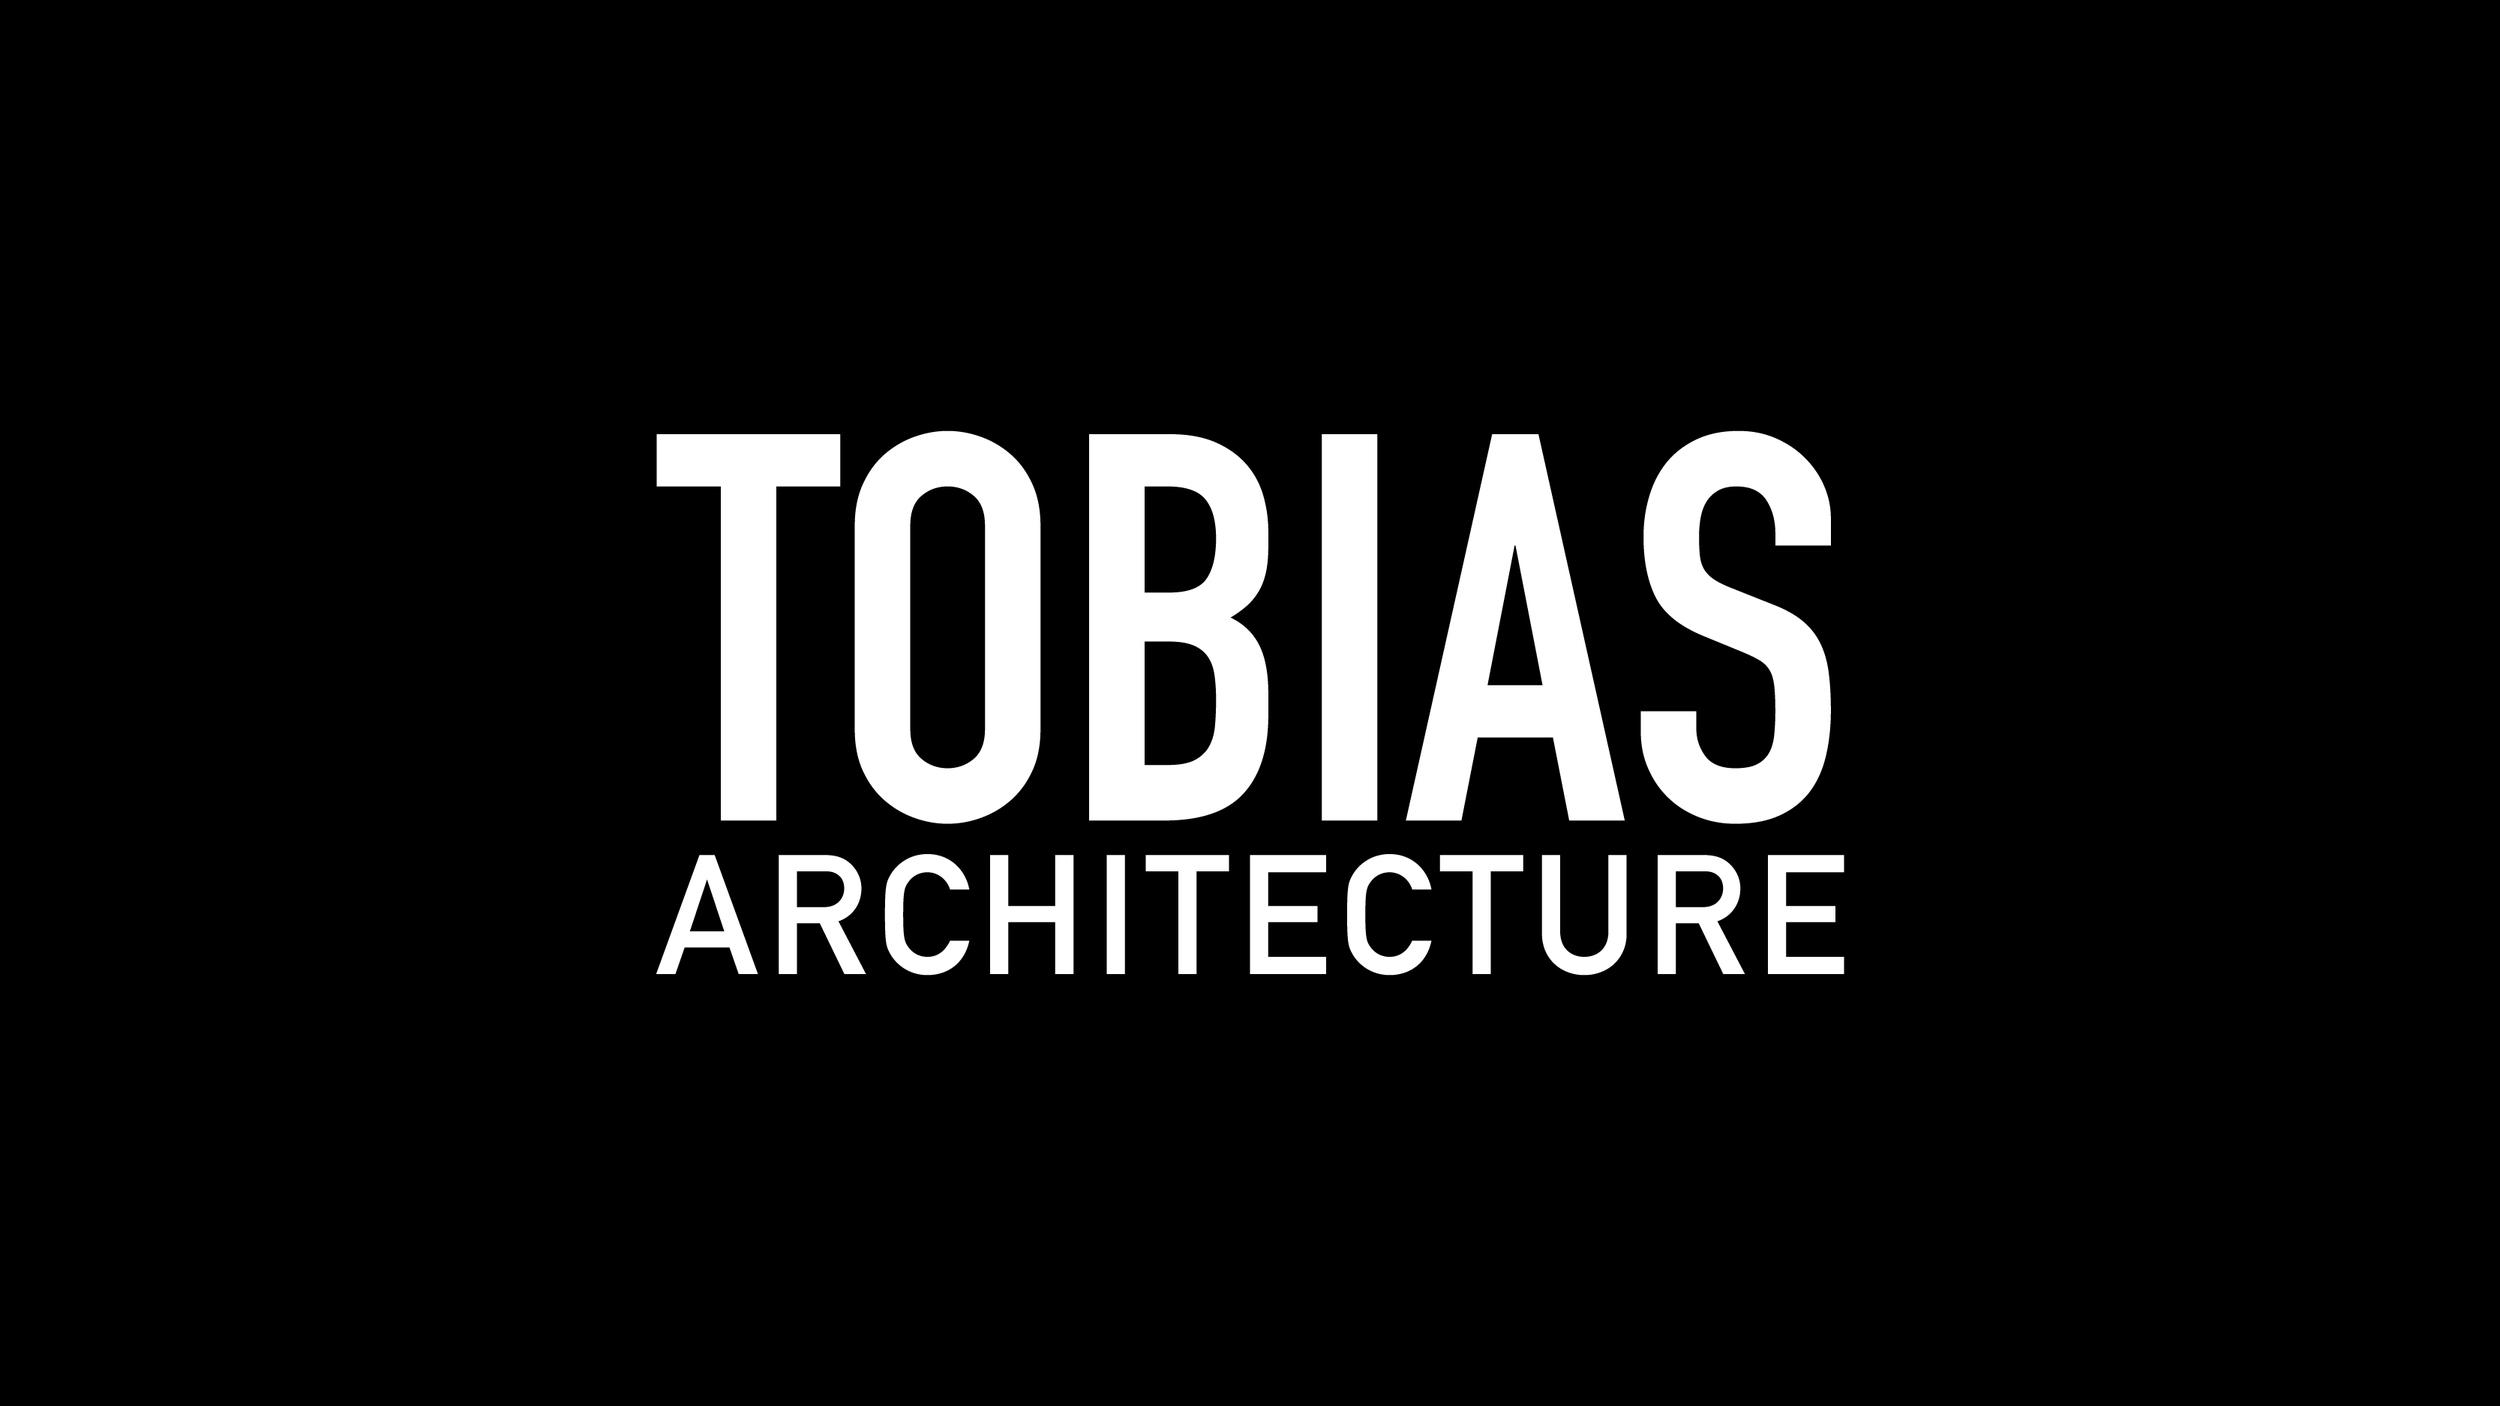 Tobias Architecture